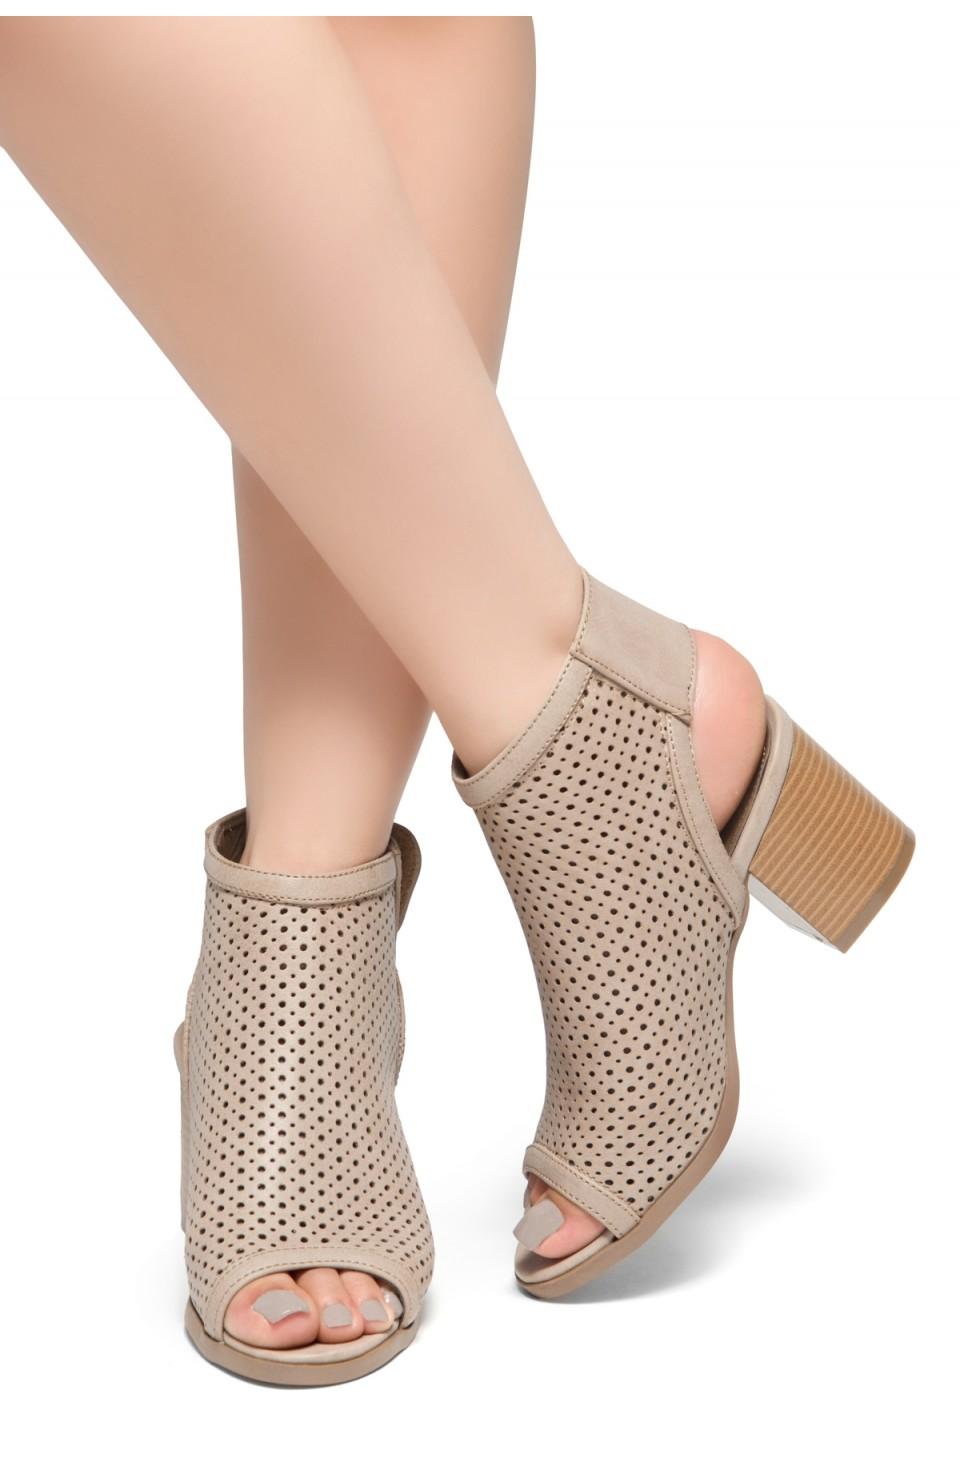 HerStyle Maddie-Block heel, Sex Peep Toe Open Back Booties (Beige)